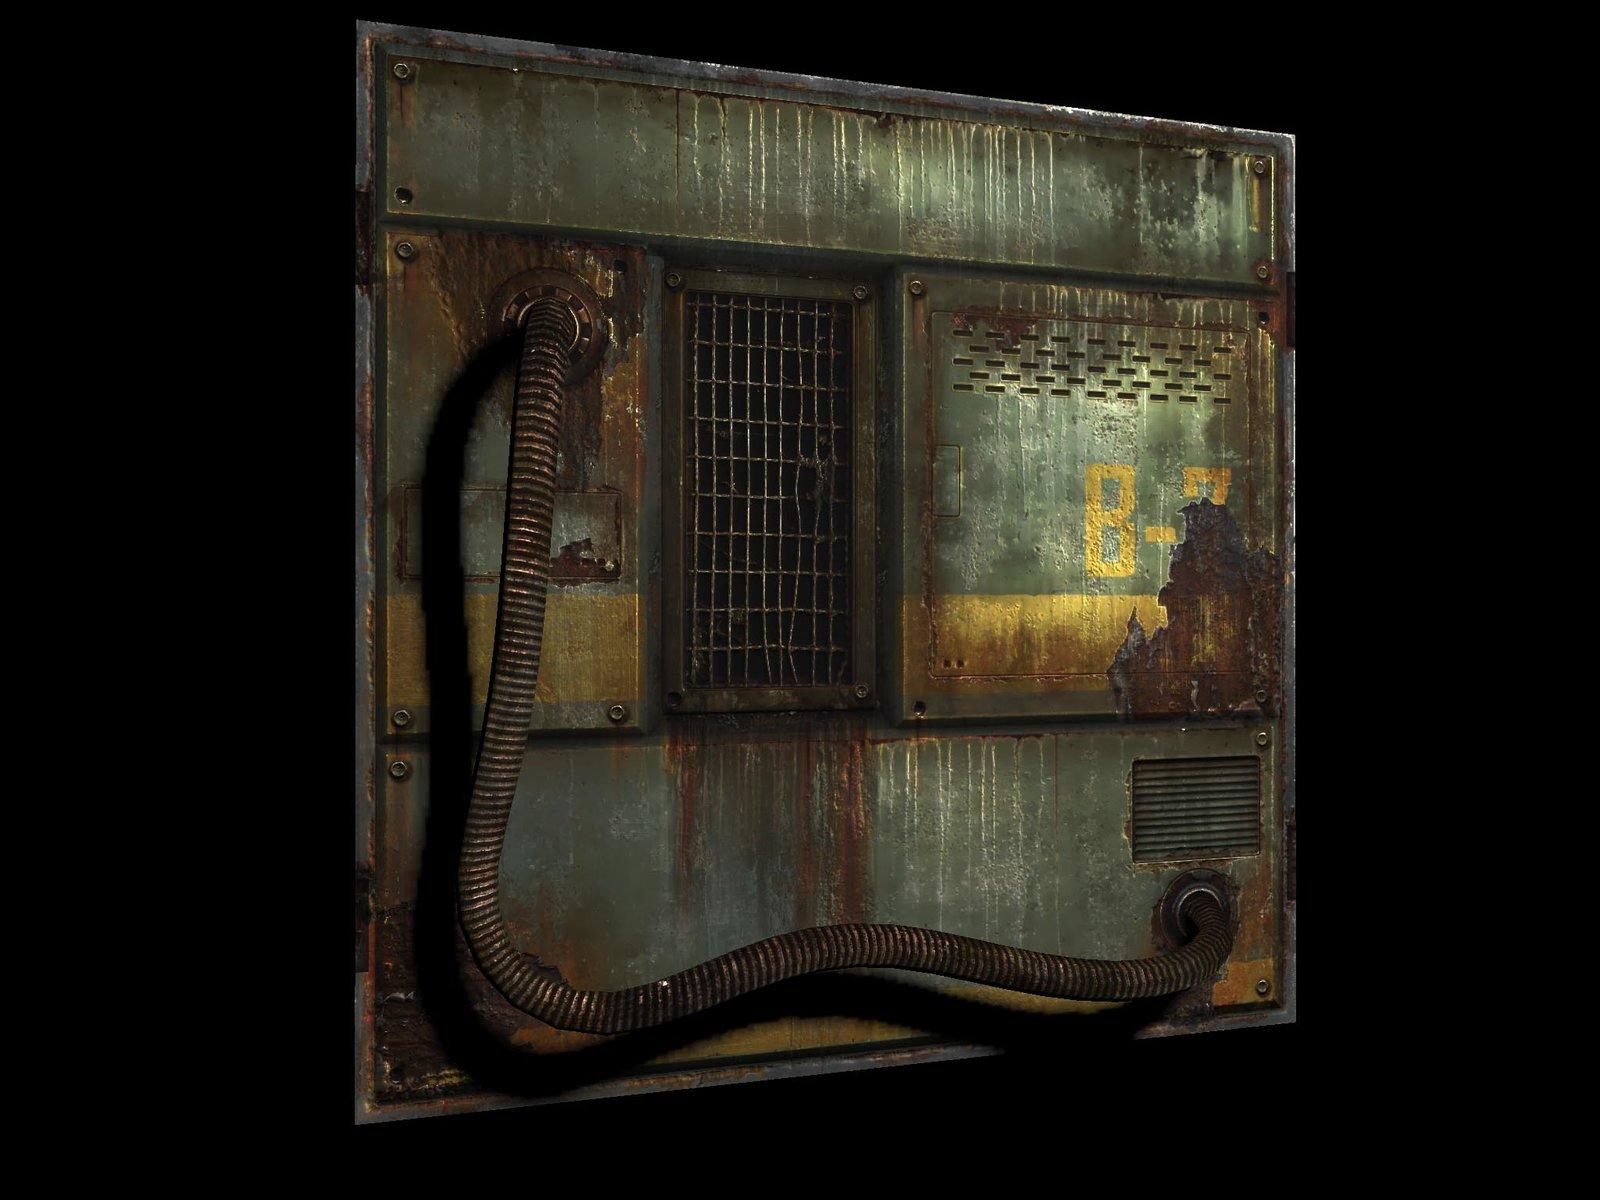 A Fallout free-style :) (2013)